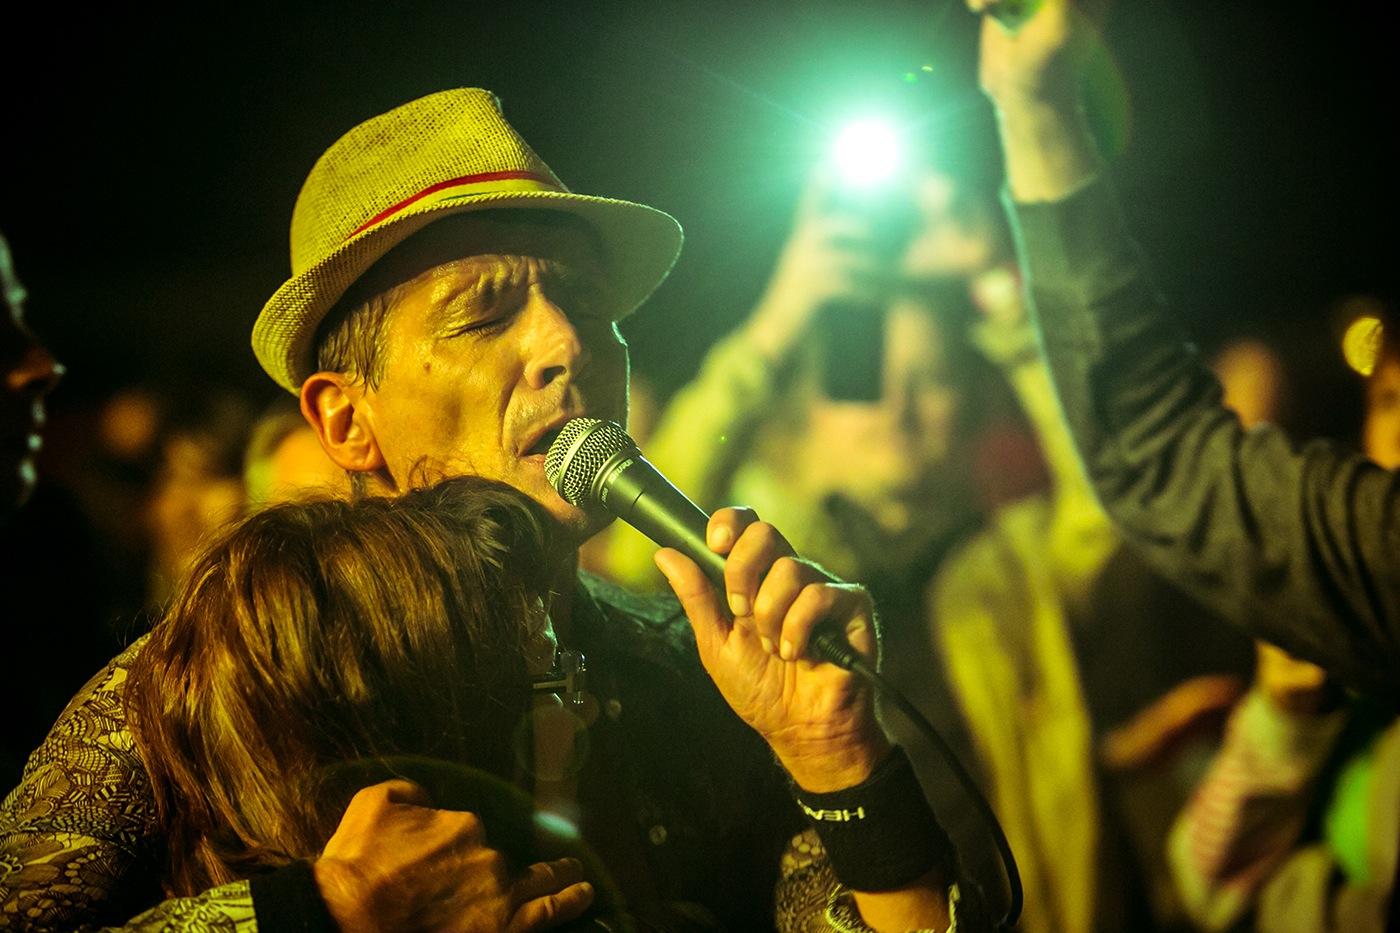 photographe-reportage-festival-rockadel-guillaume-heraud-021-small